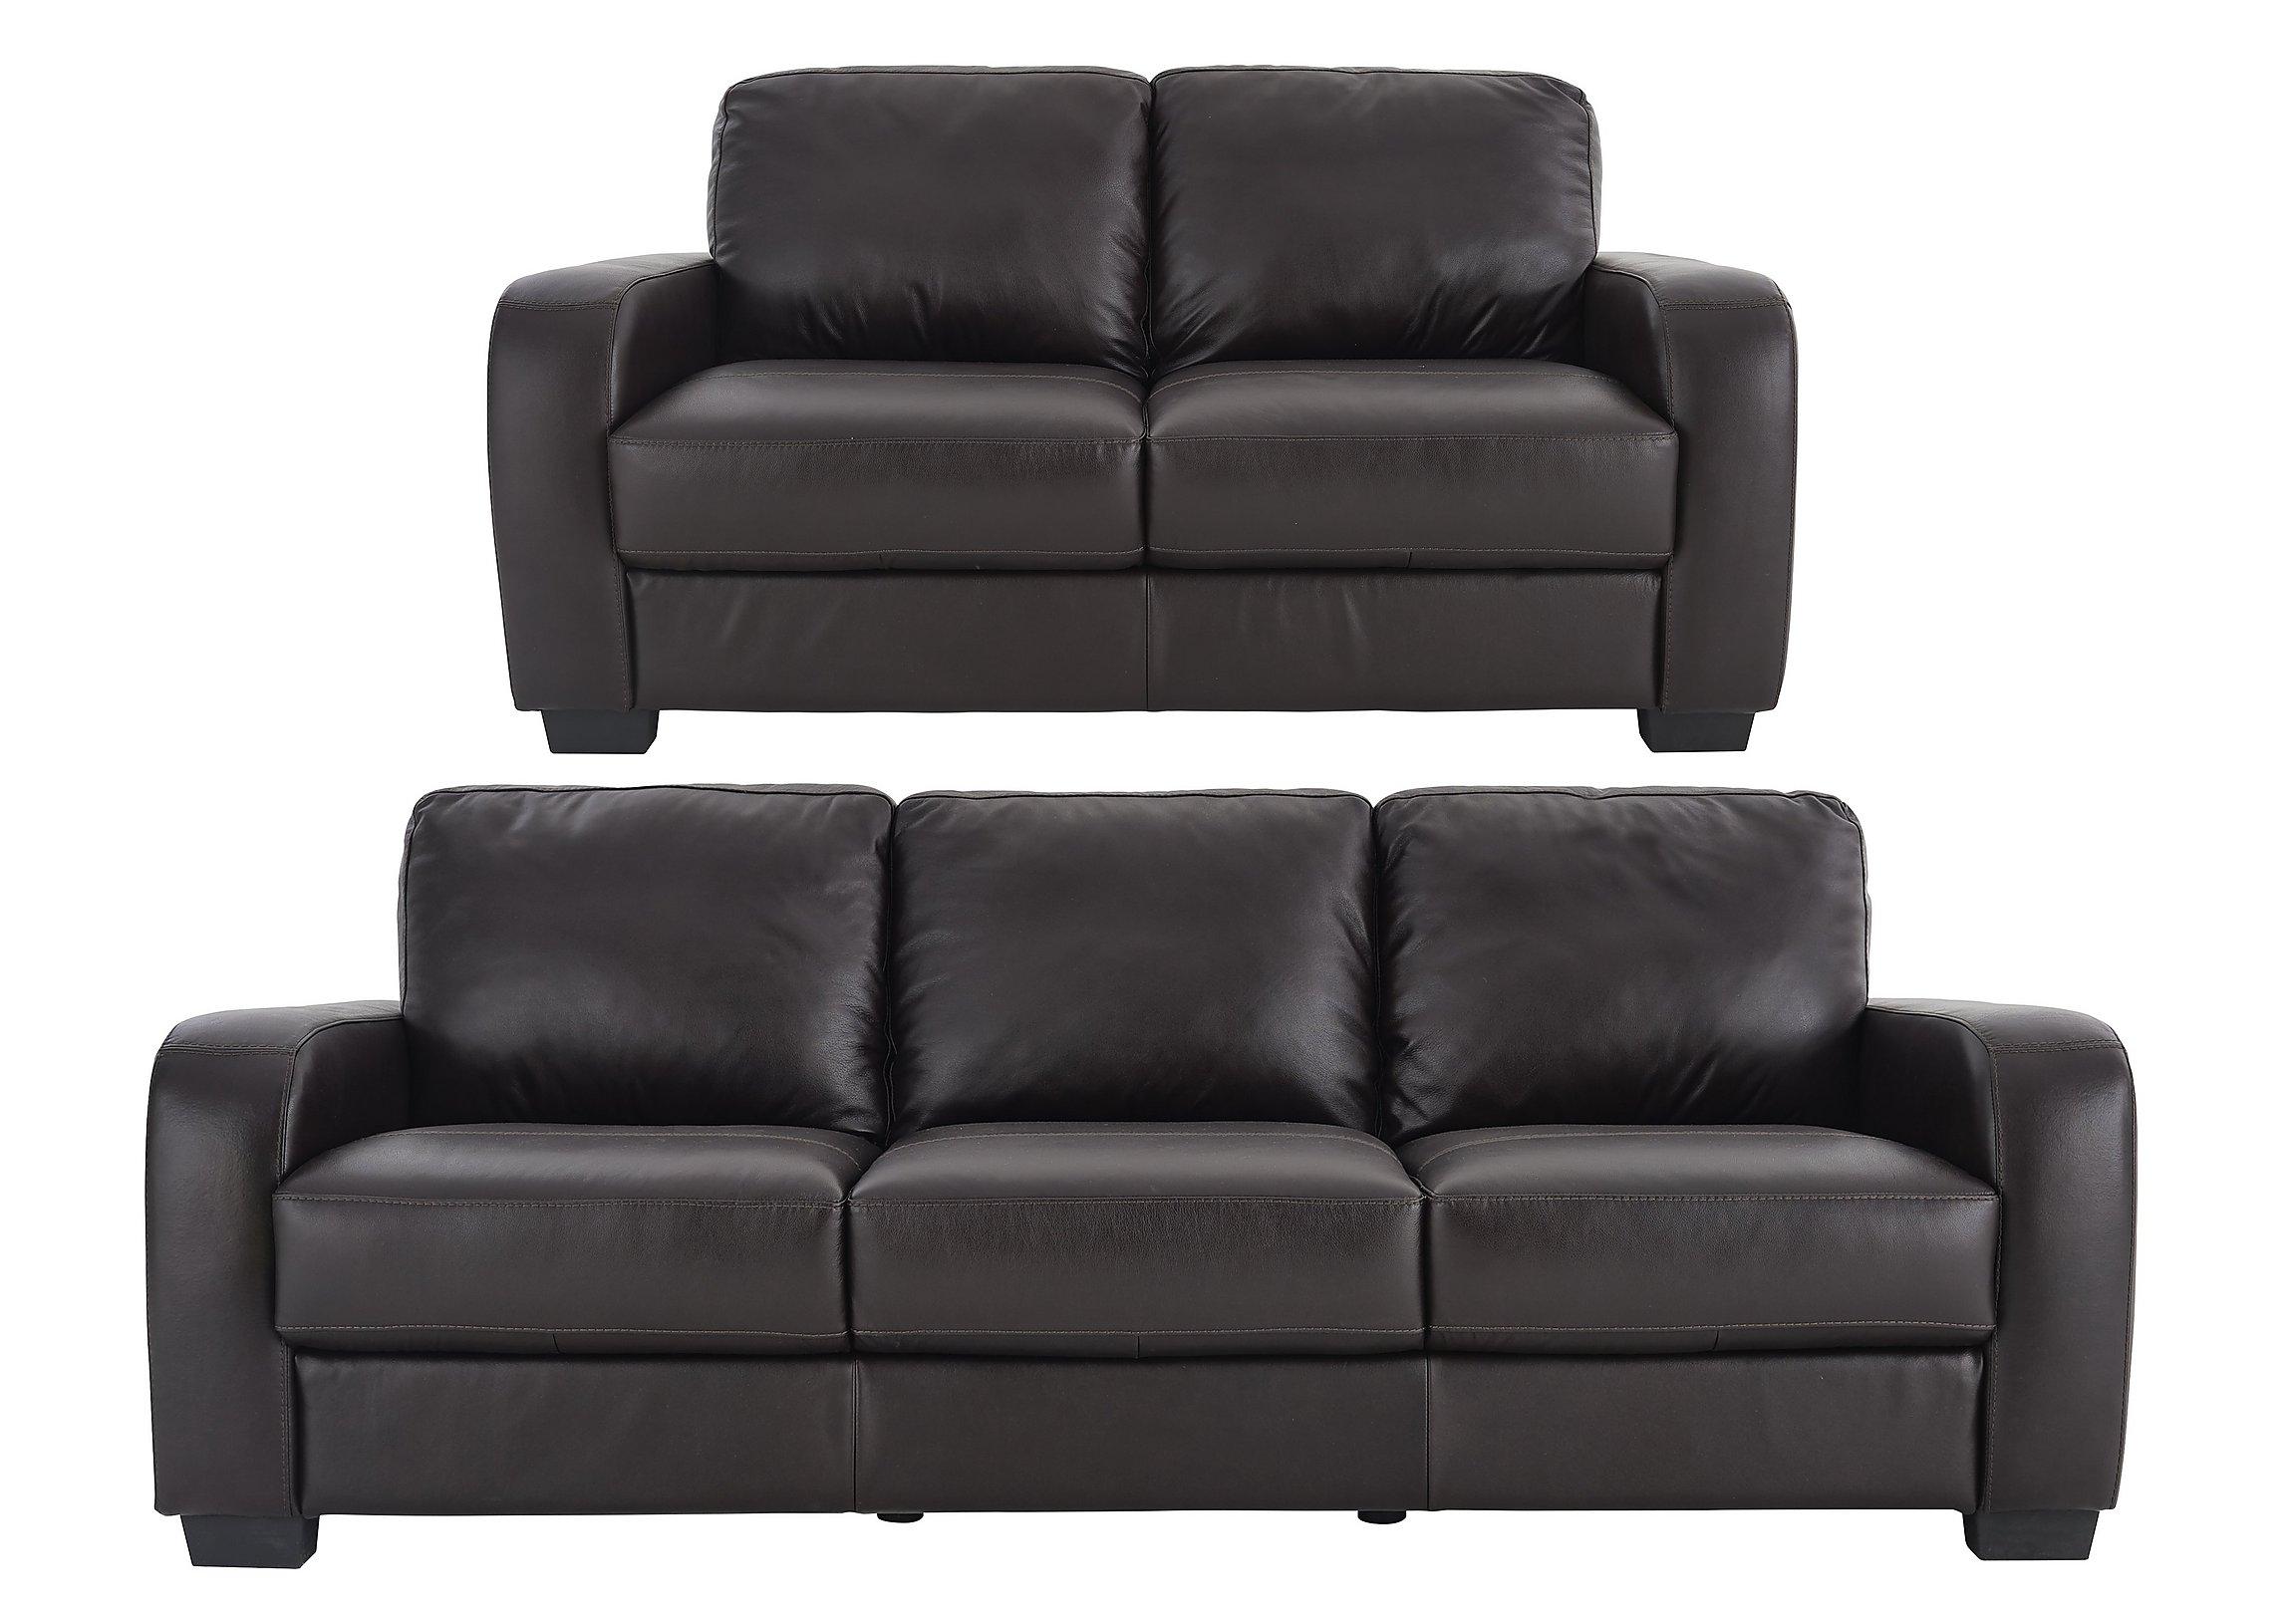 Astor Seater Leather Sofas Furniture Village - Mahogany leather sofa